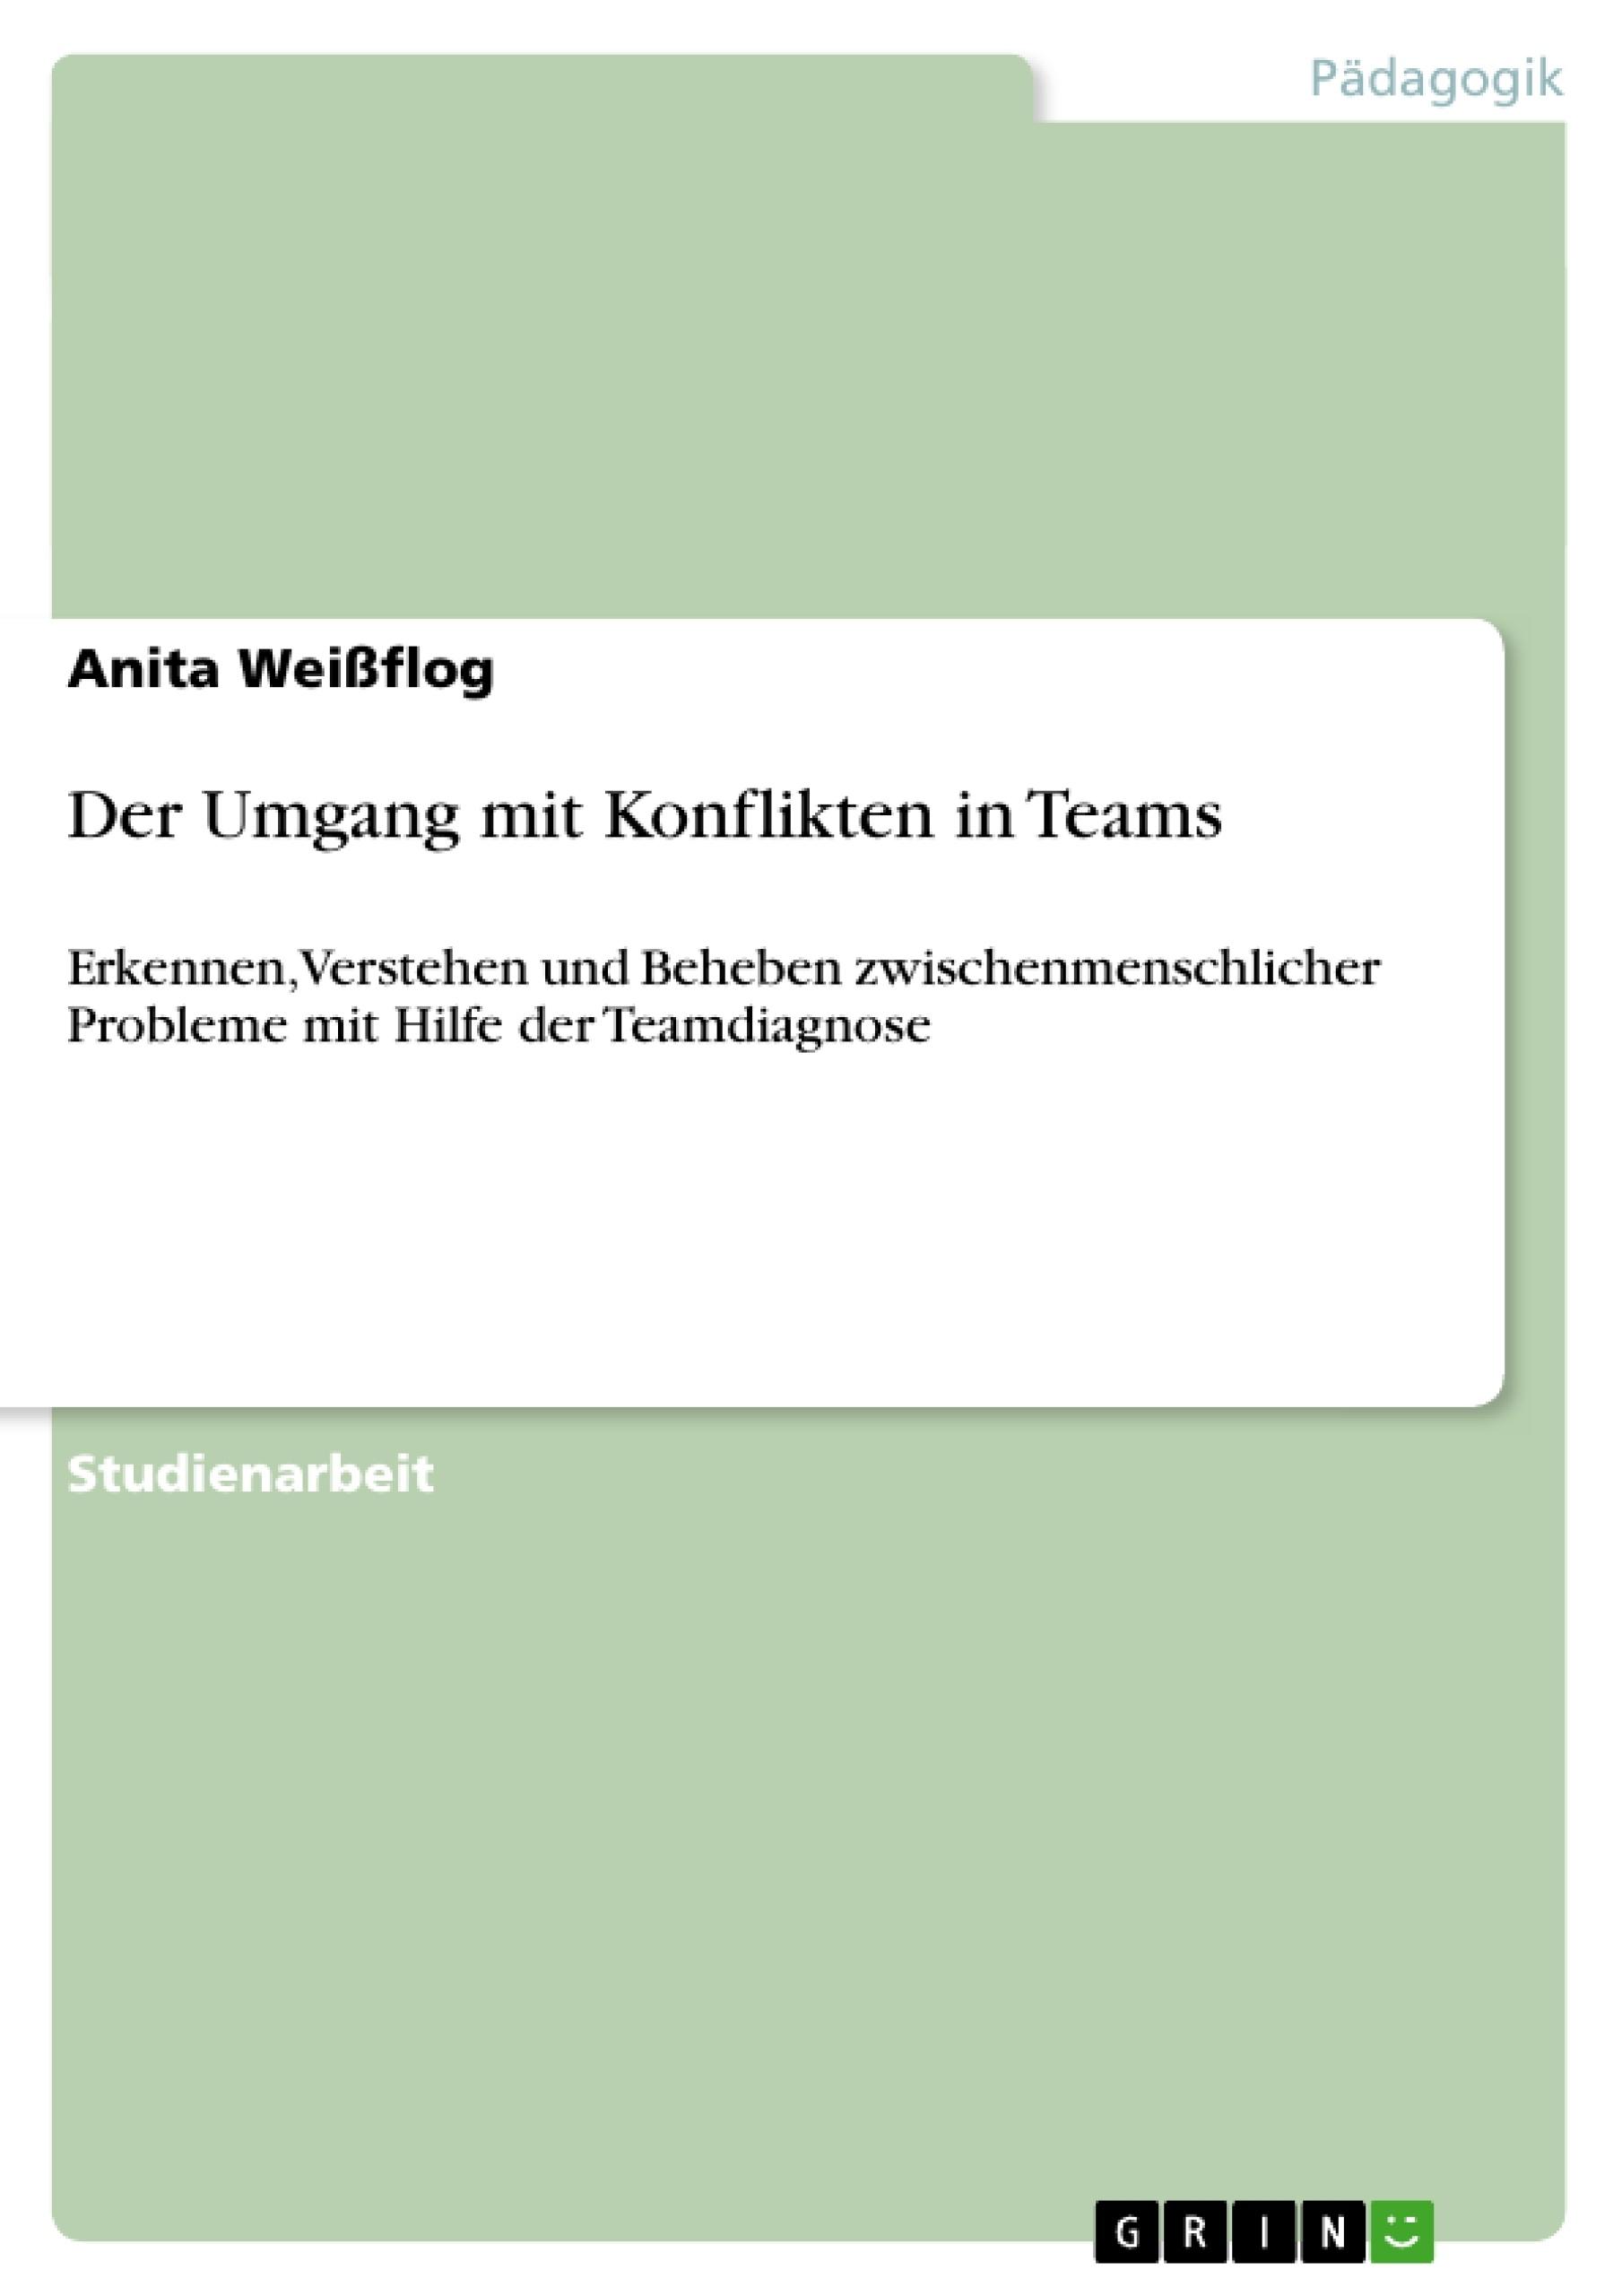 Titel: Der Umgang mit Konflikten in Teams